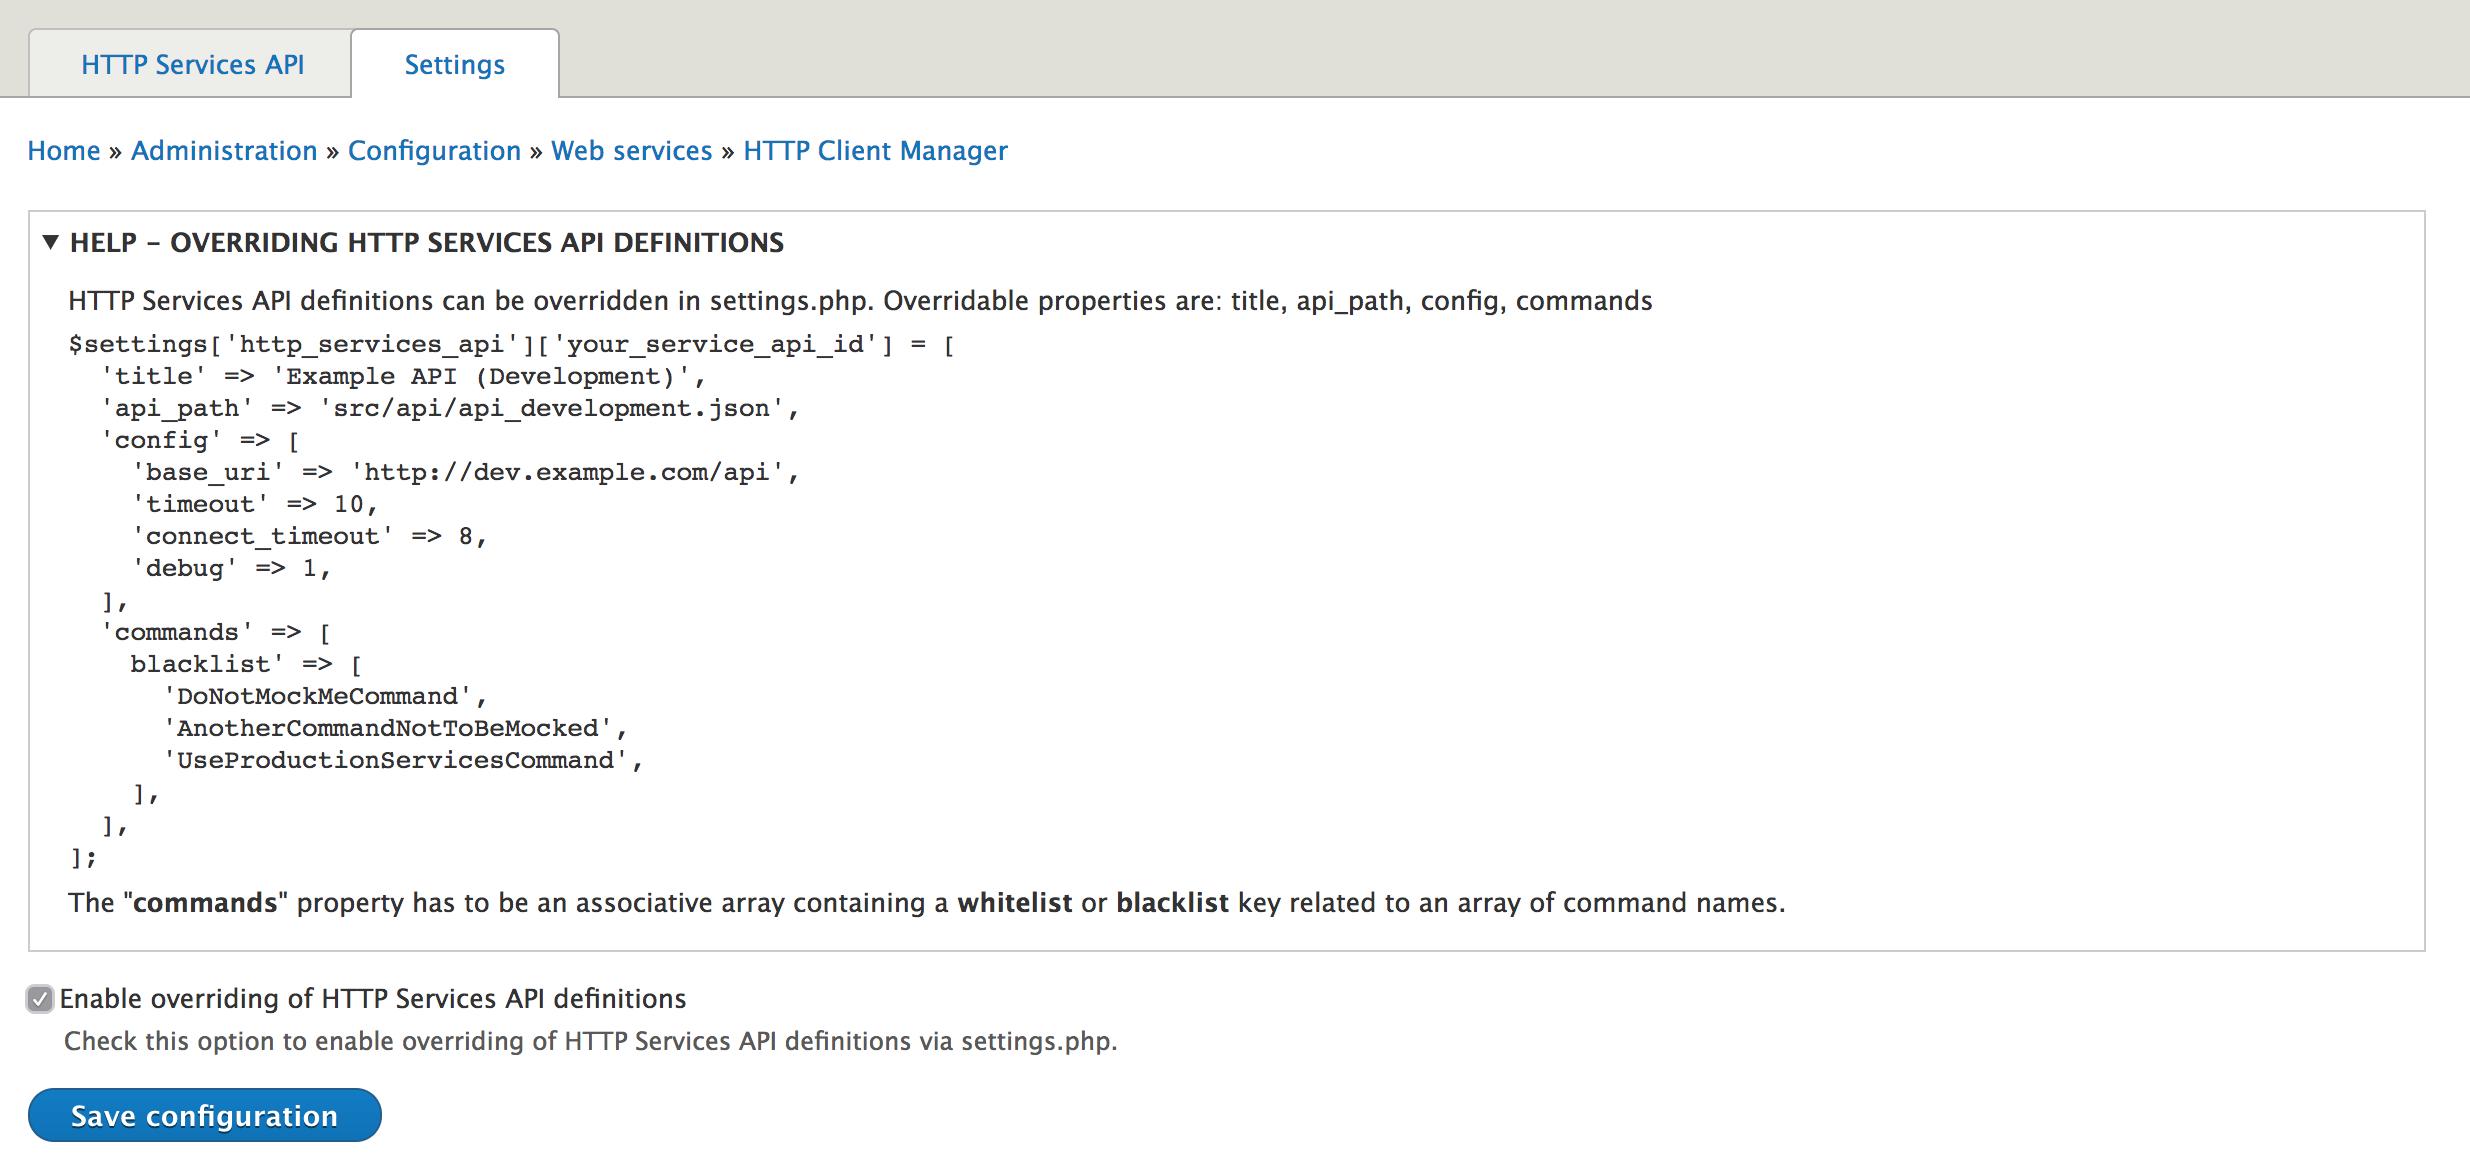 Overriding HTTP Services API | Drupal 8 guide on Drupal org